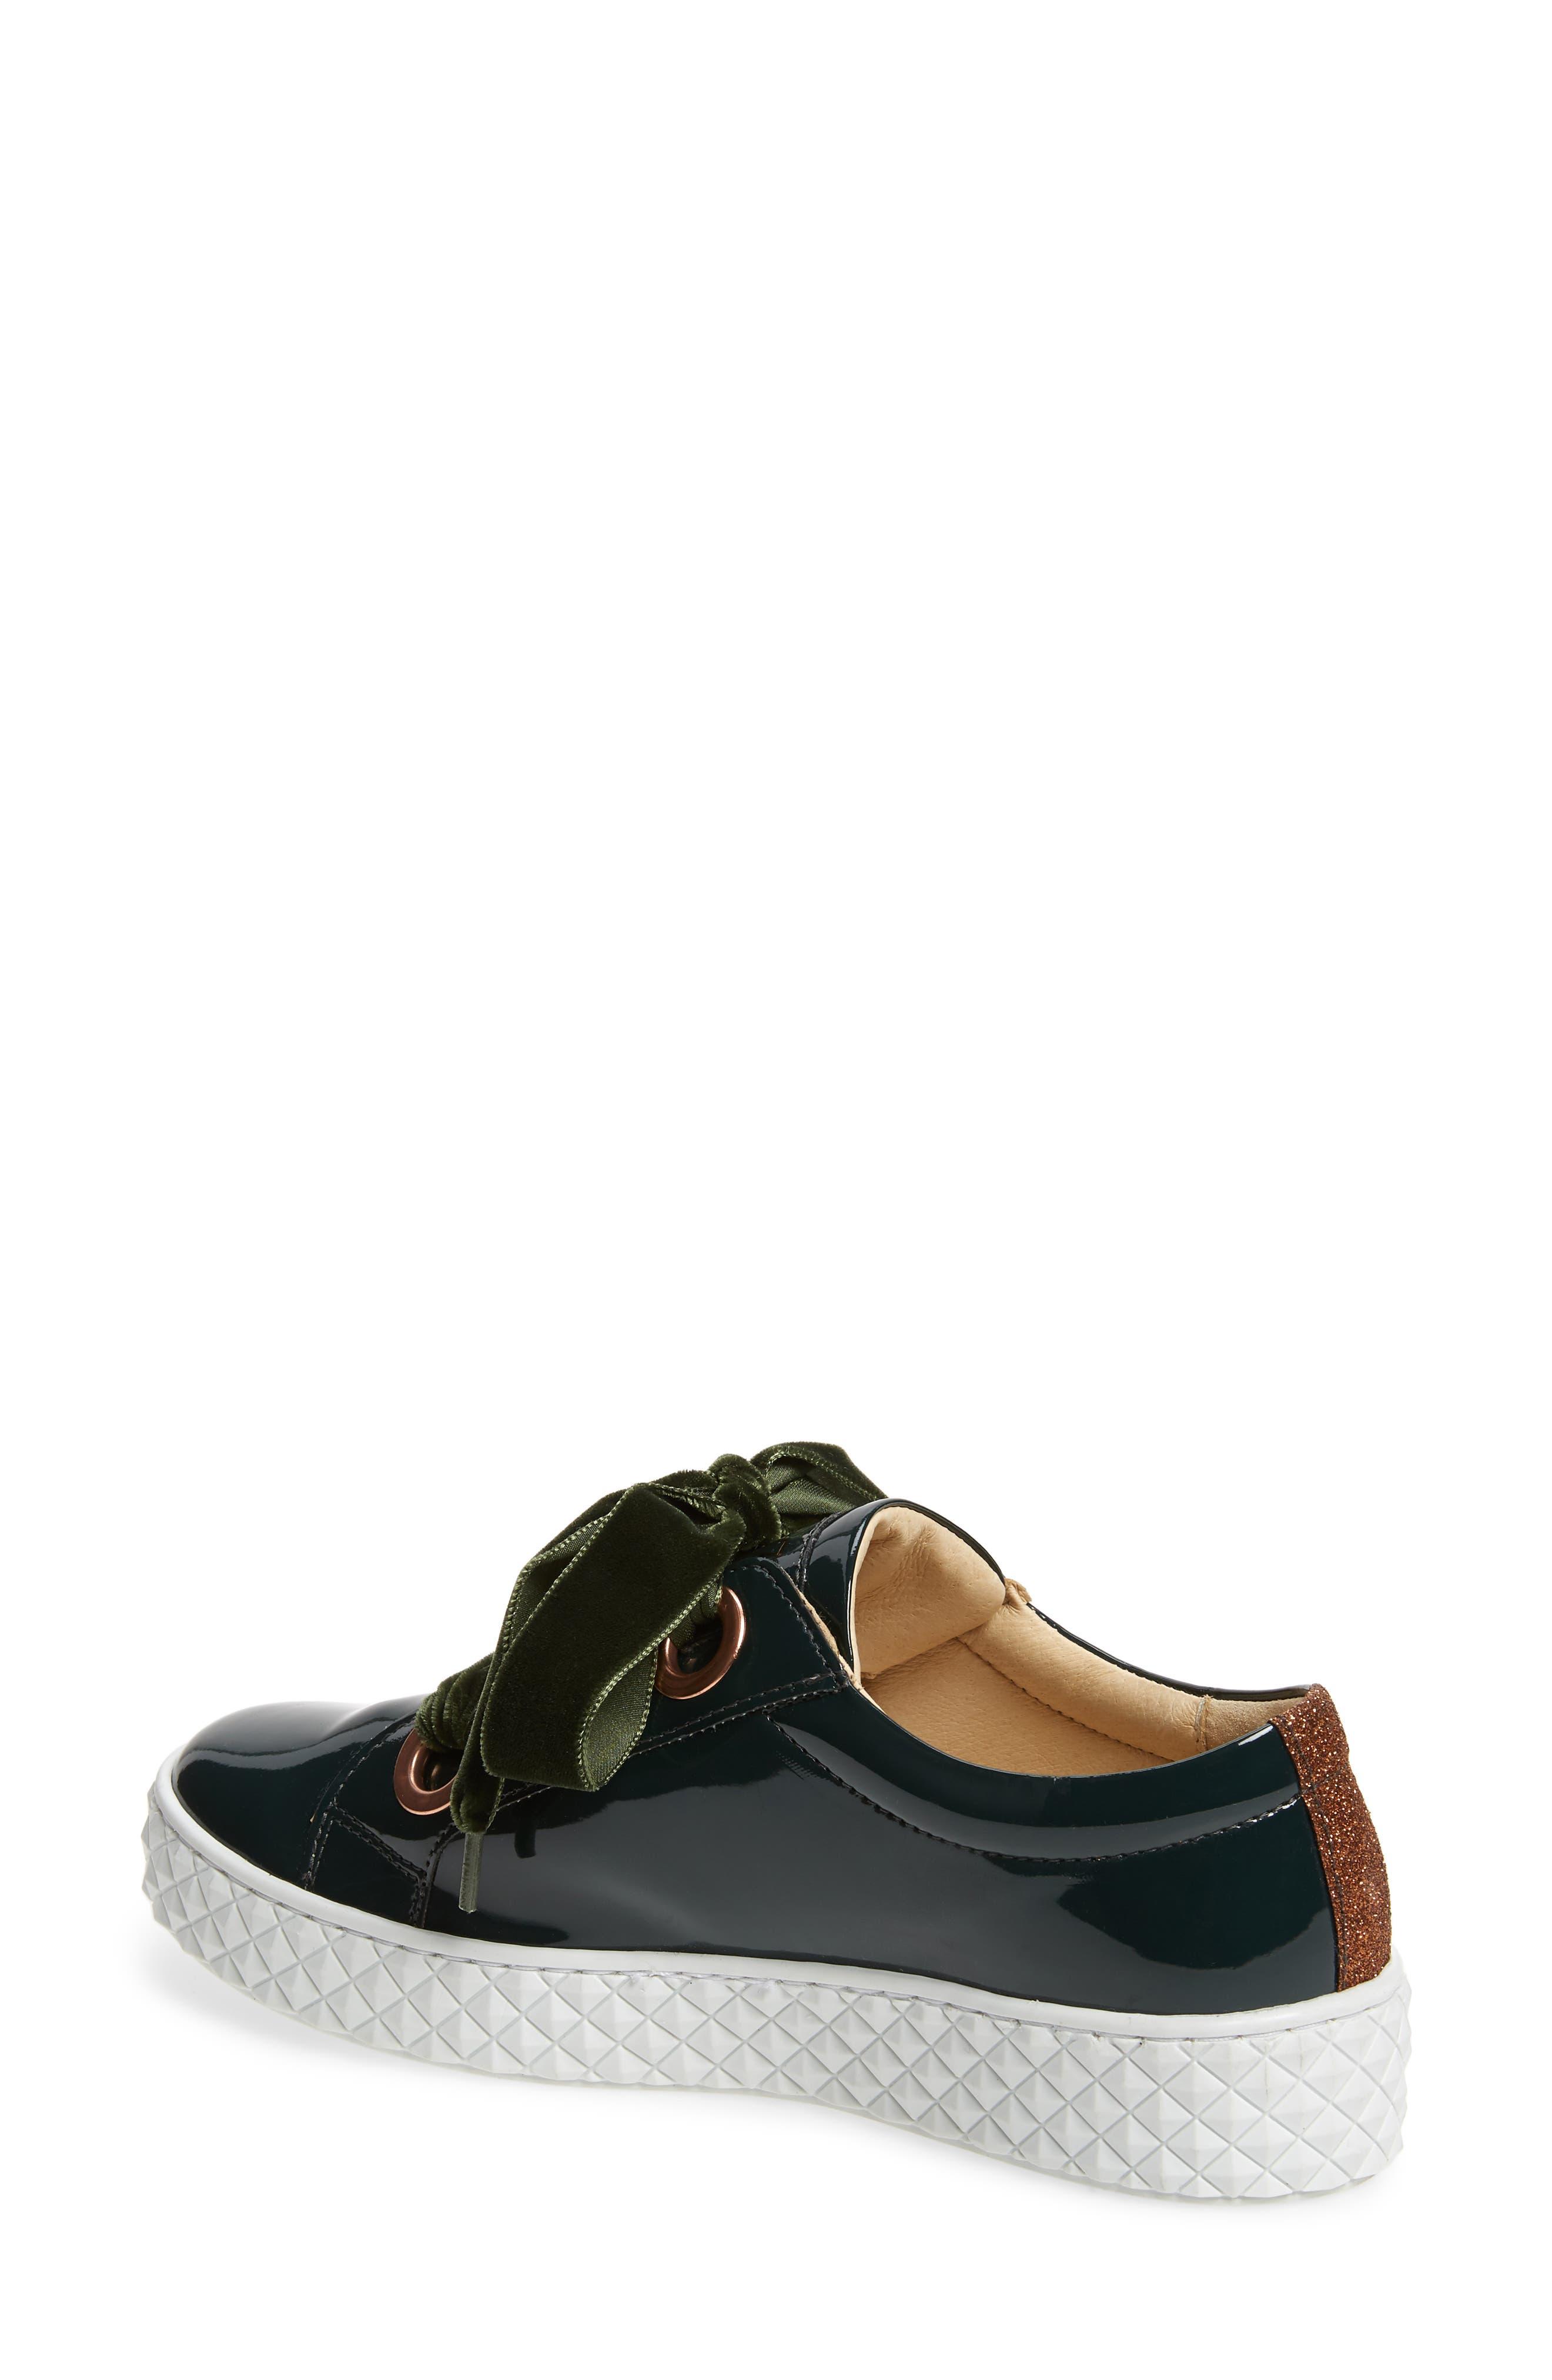 Acton III Sneaker,                             Alternate thumbnail 2, color,                             BOTTLE GREEN LEATHER